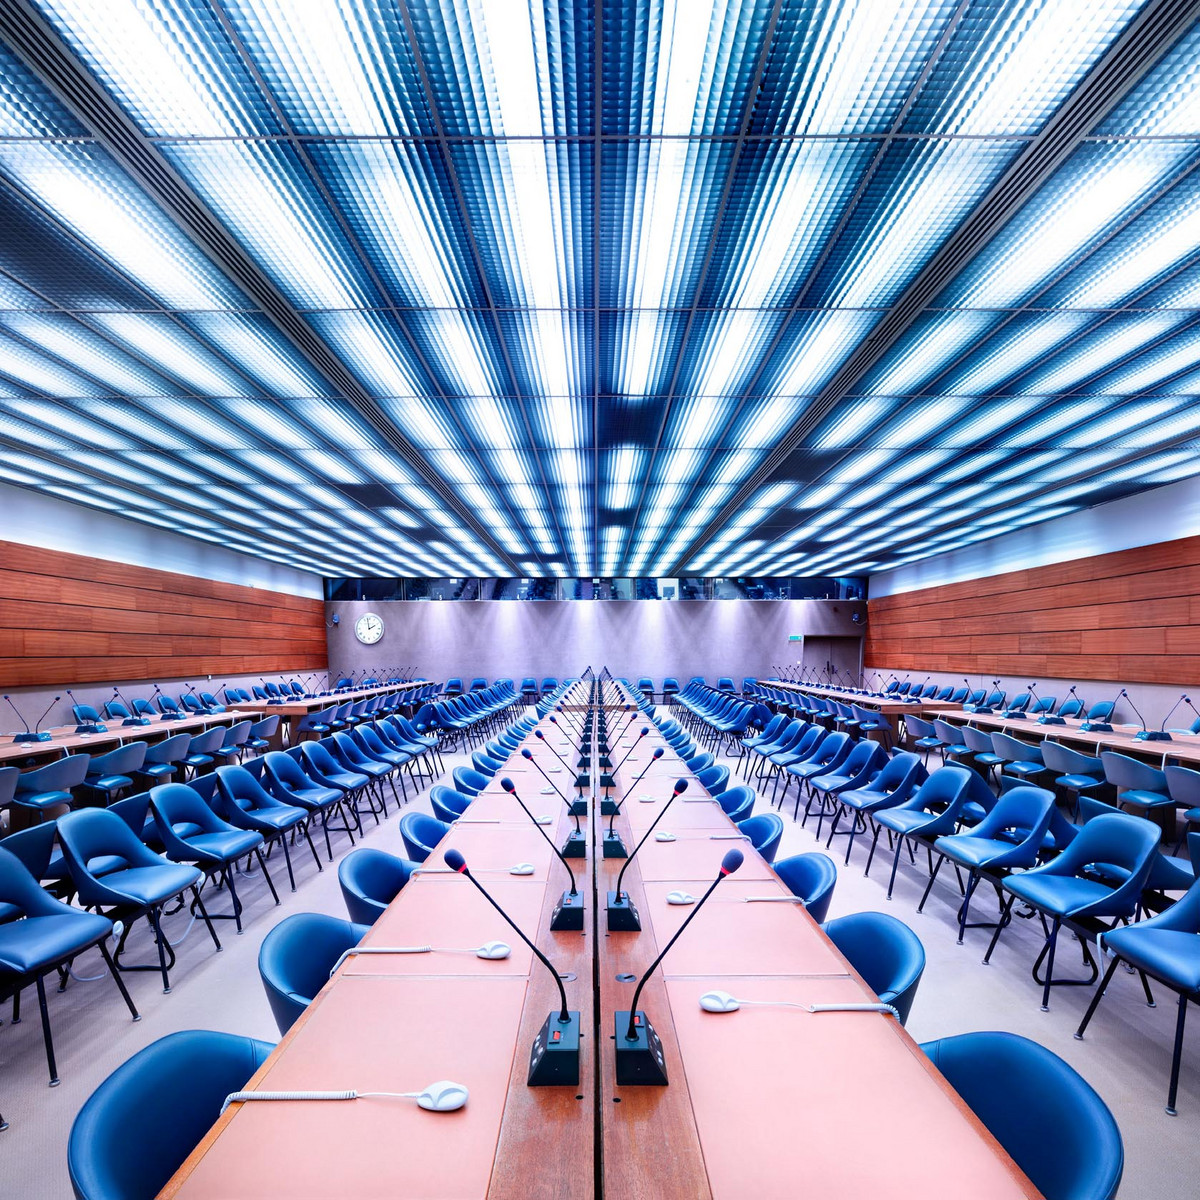 Luca Zanier, UN Room XXIV, Geneva, 2013 (detail) © Luca Zanier